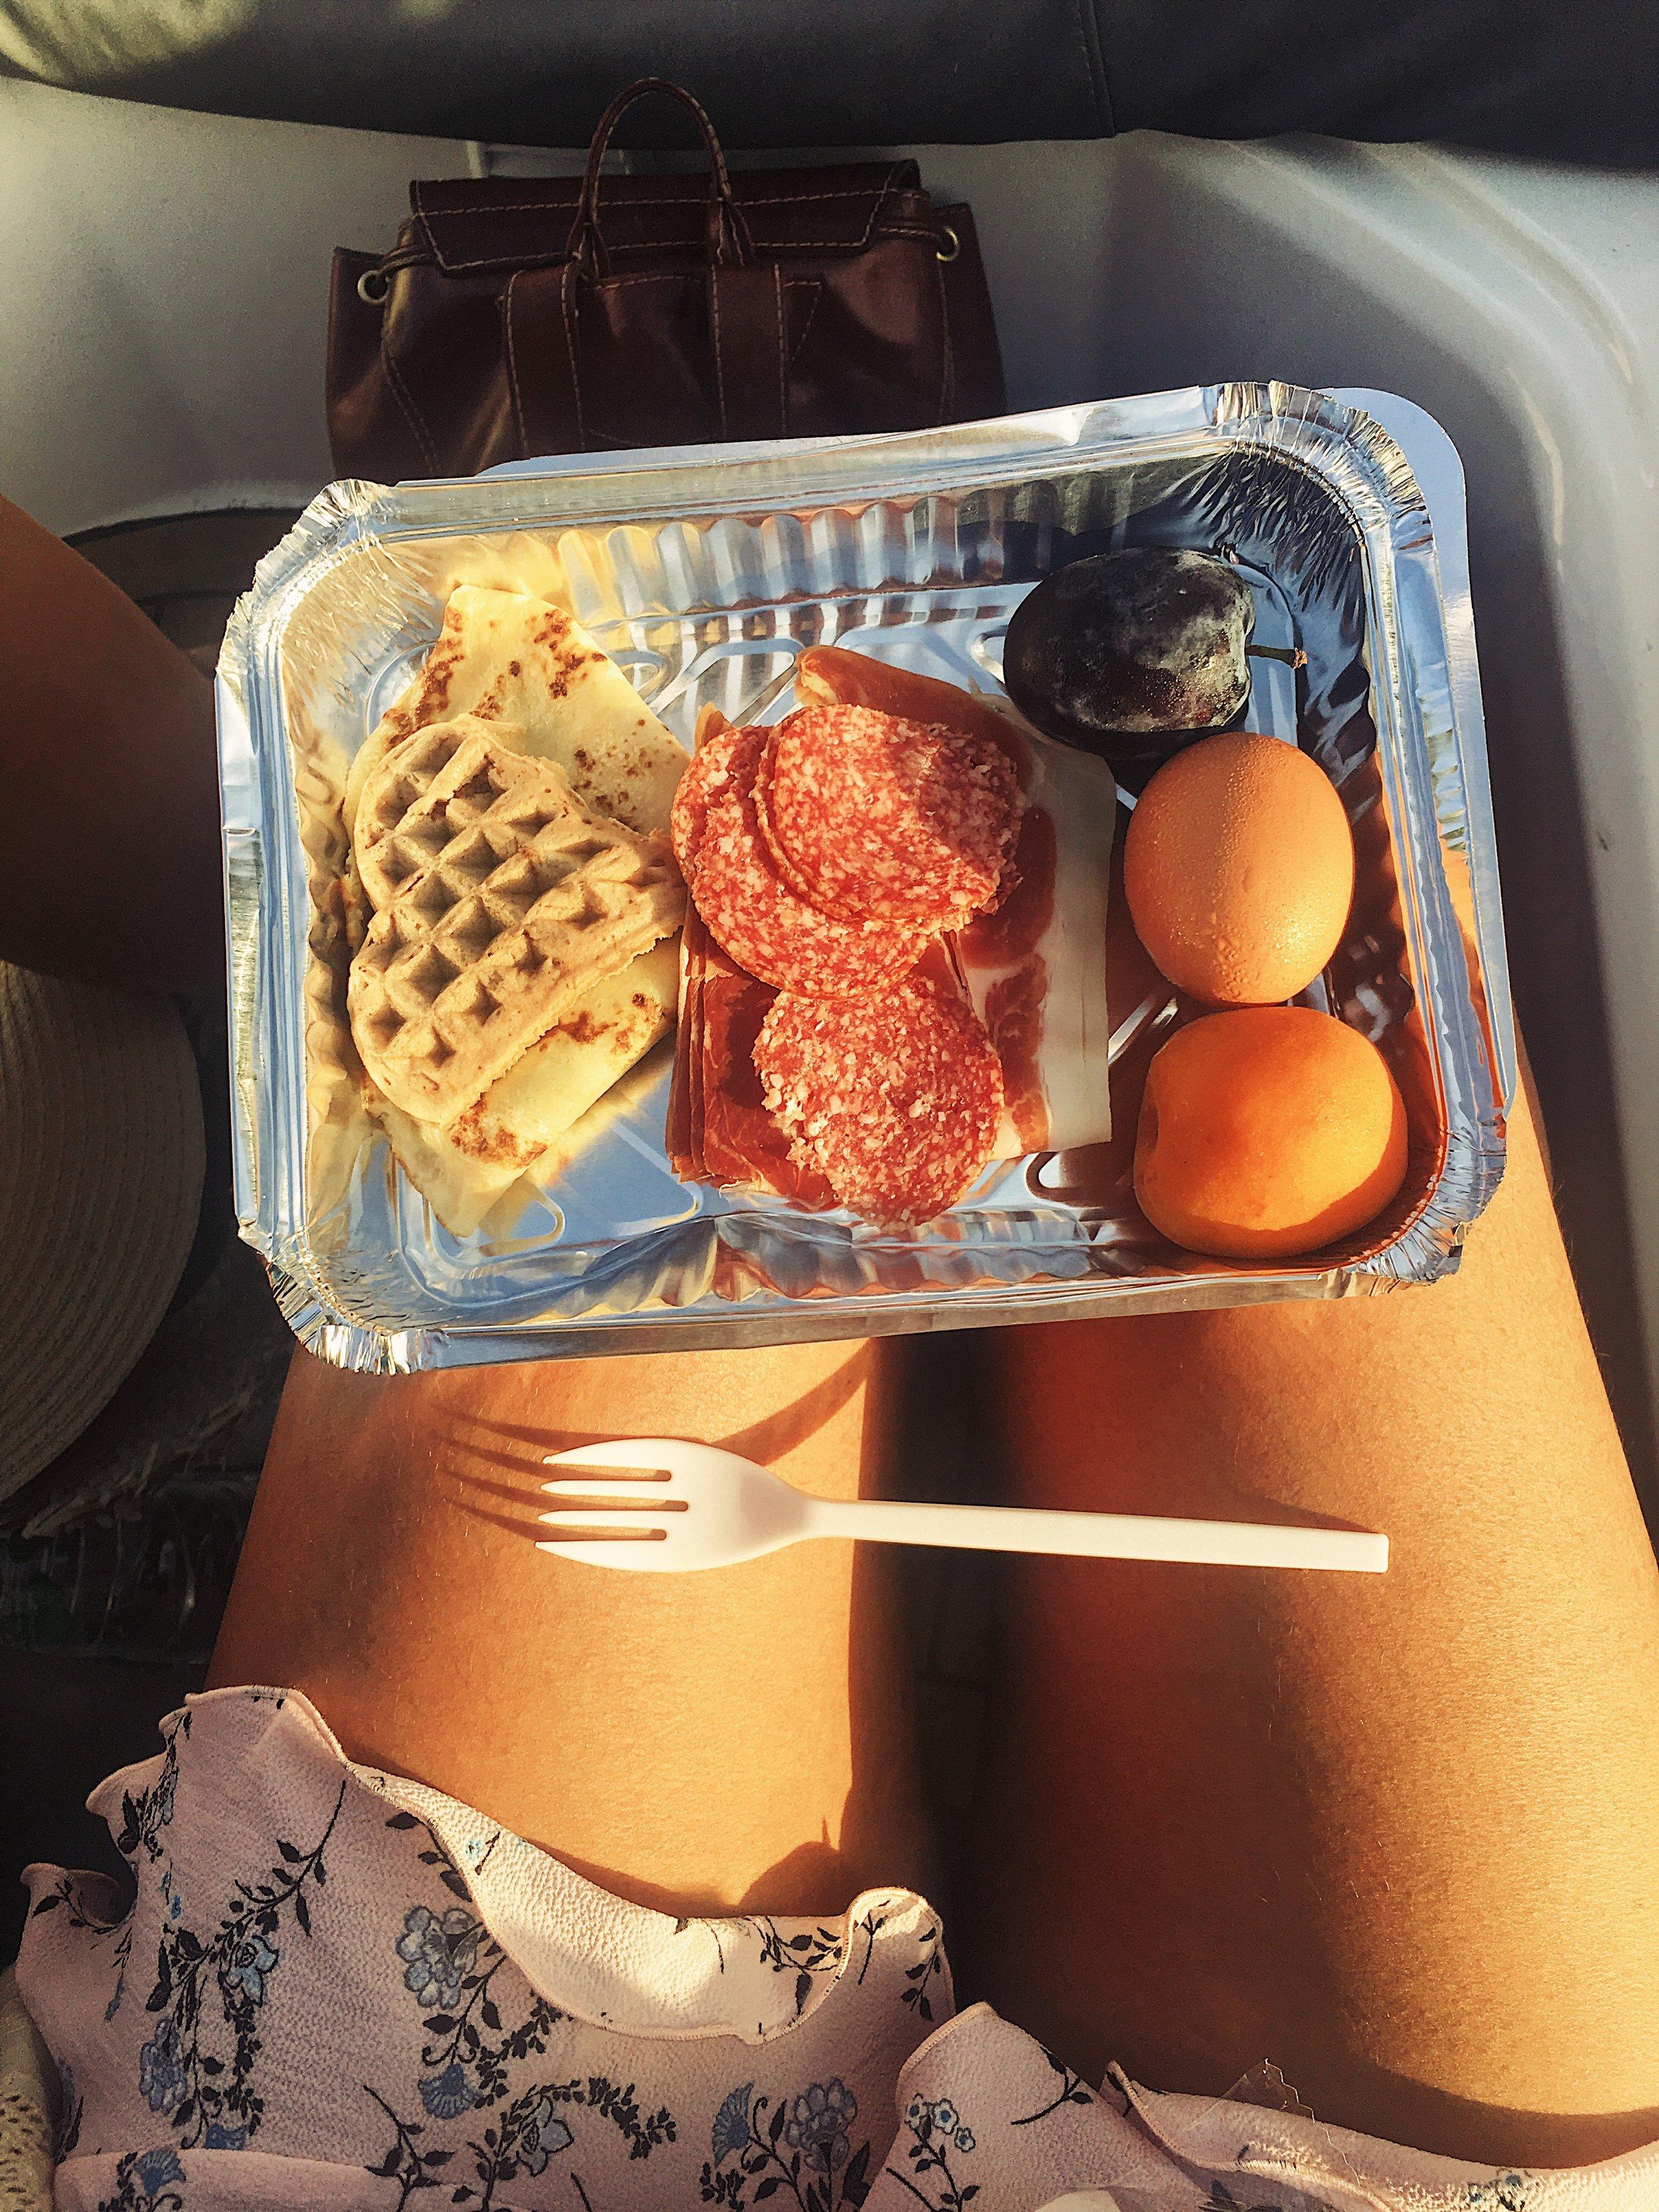 The Admiral Zaton - Takeaway Breakfast before Krka - Sibenik, Croatia - illumelation